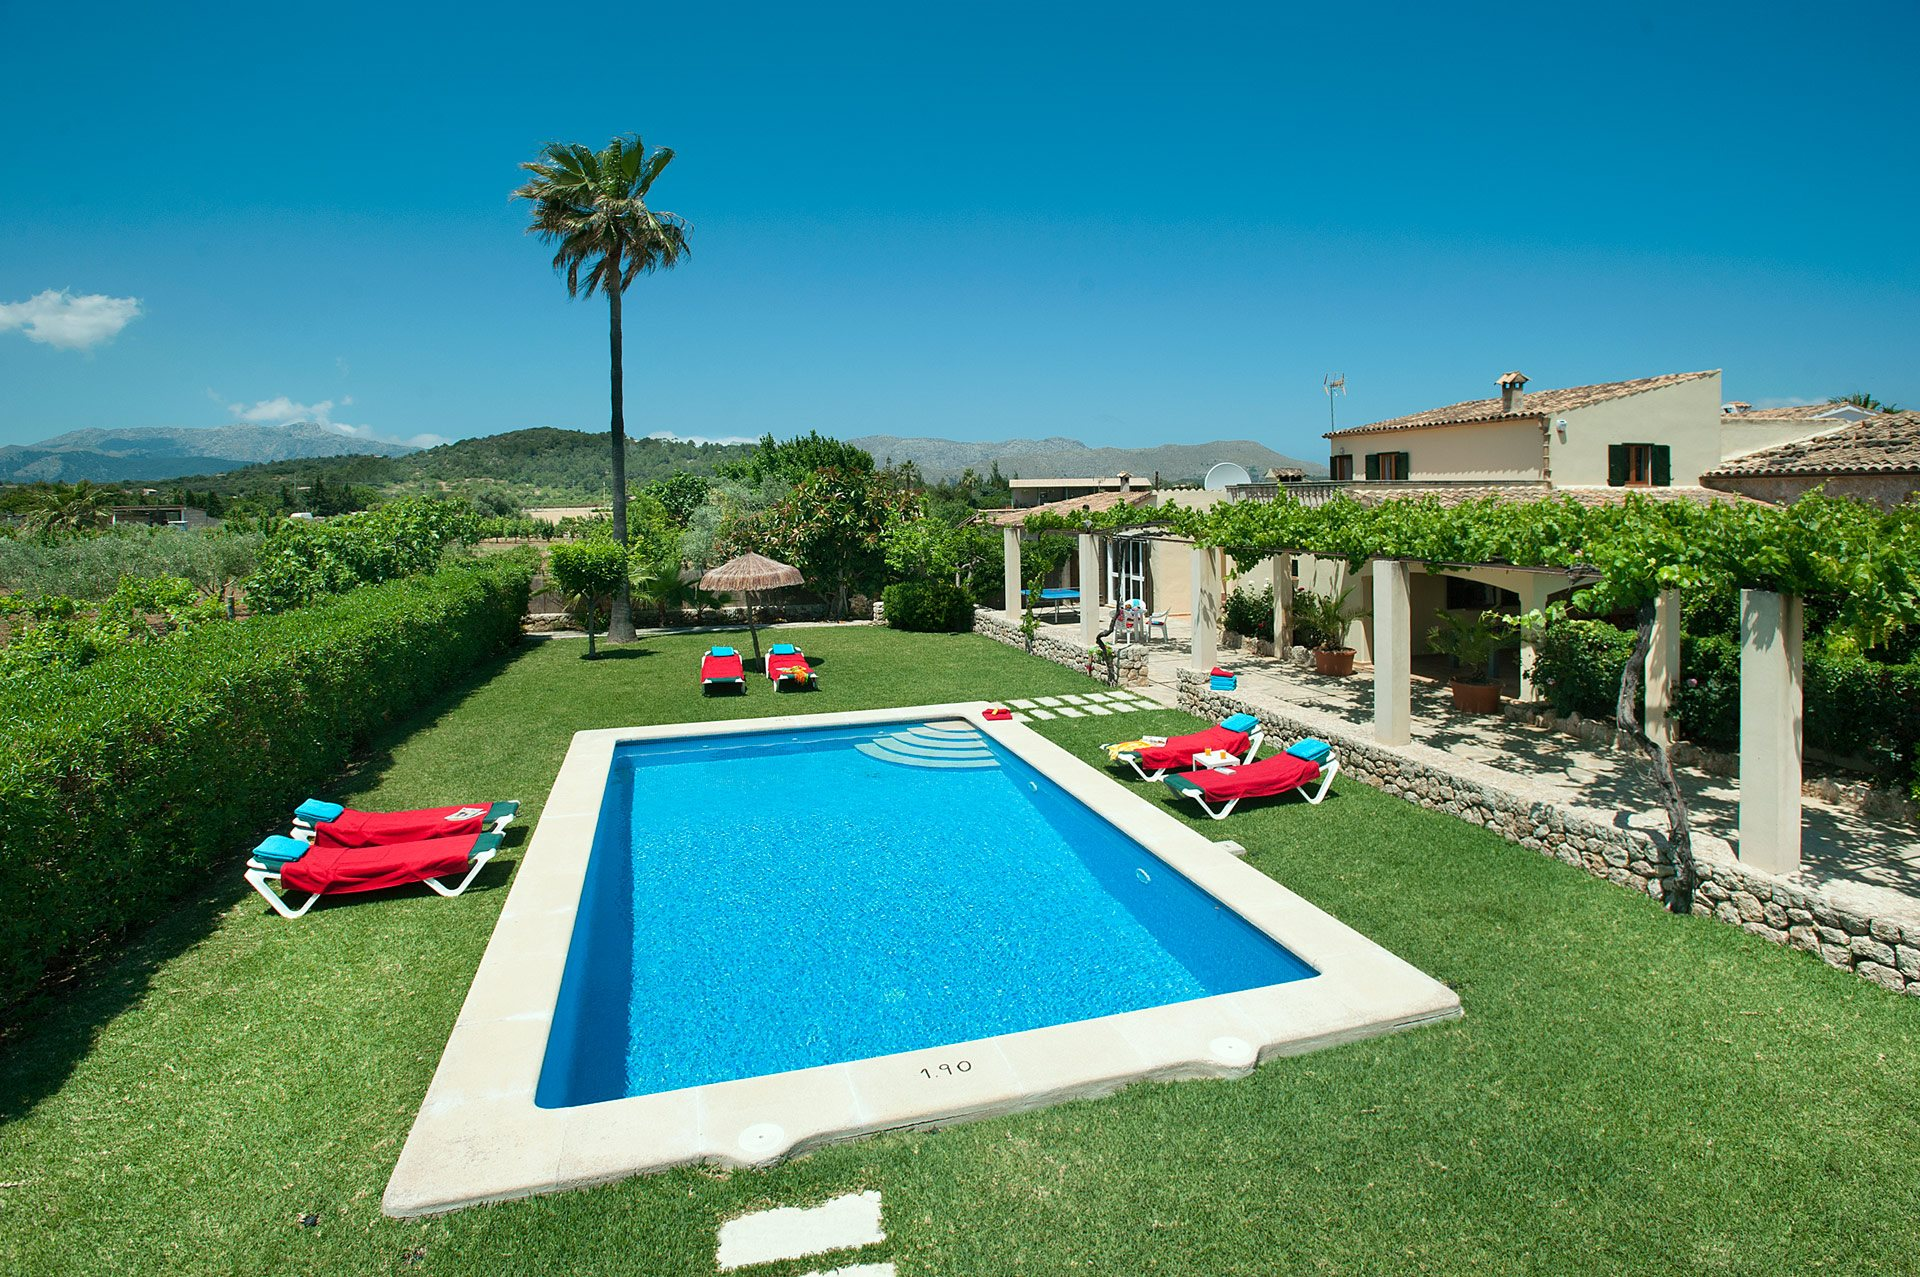 Villa Guaita, Pollensa, Majorca, Spain